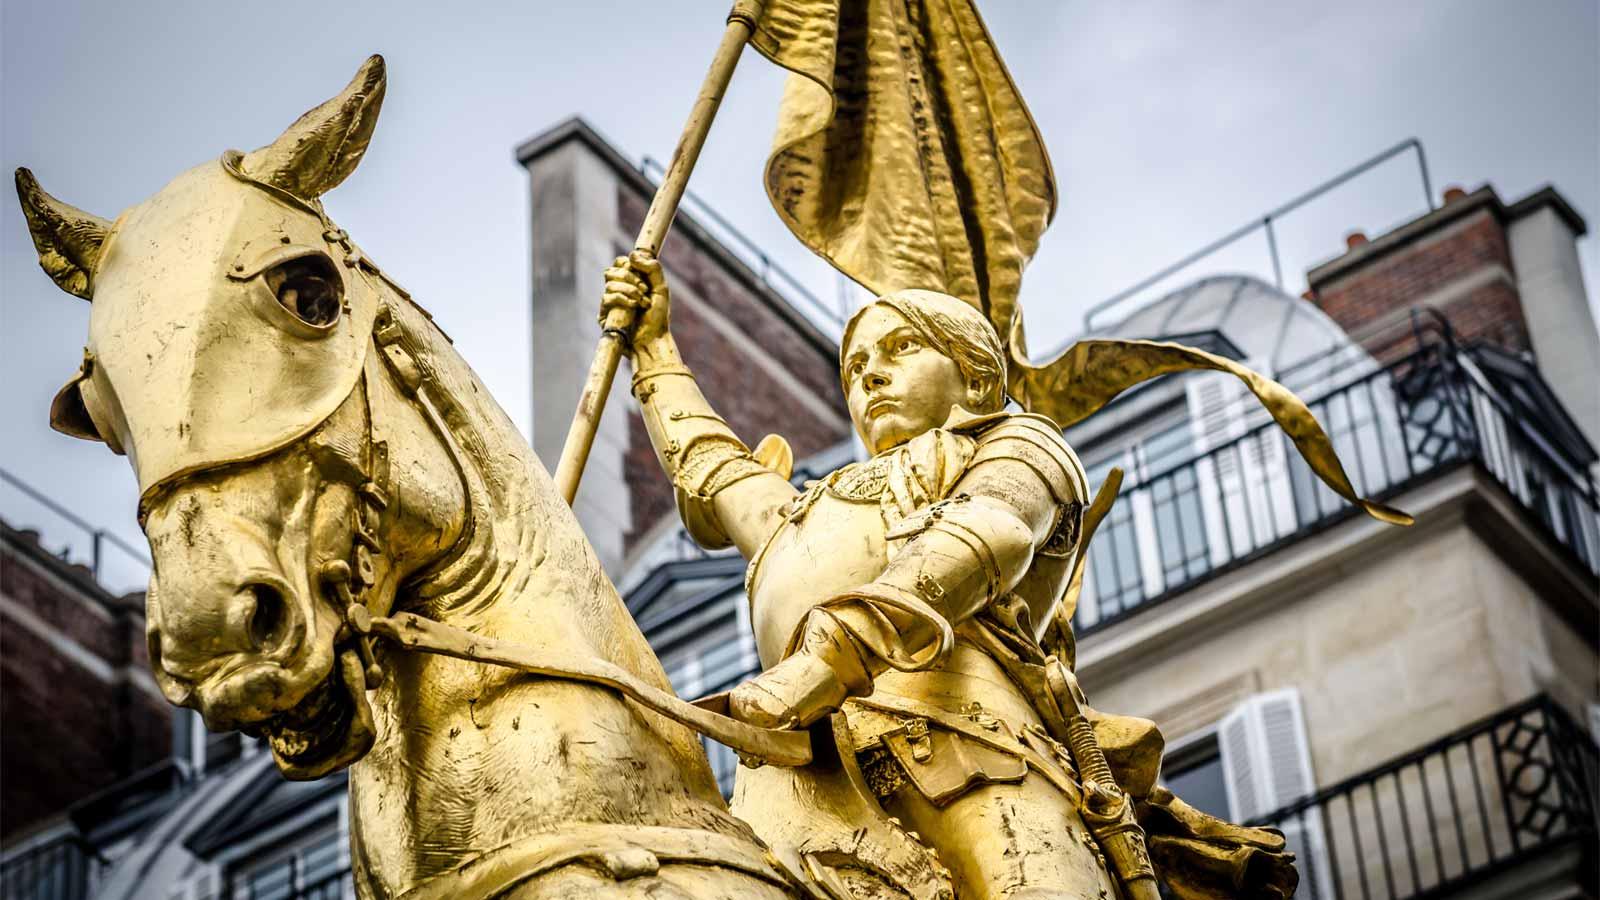 Joan of Arc   source: BlackMac/Shutterstock.com